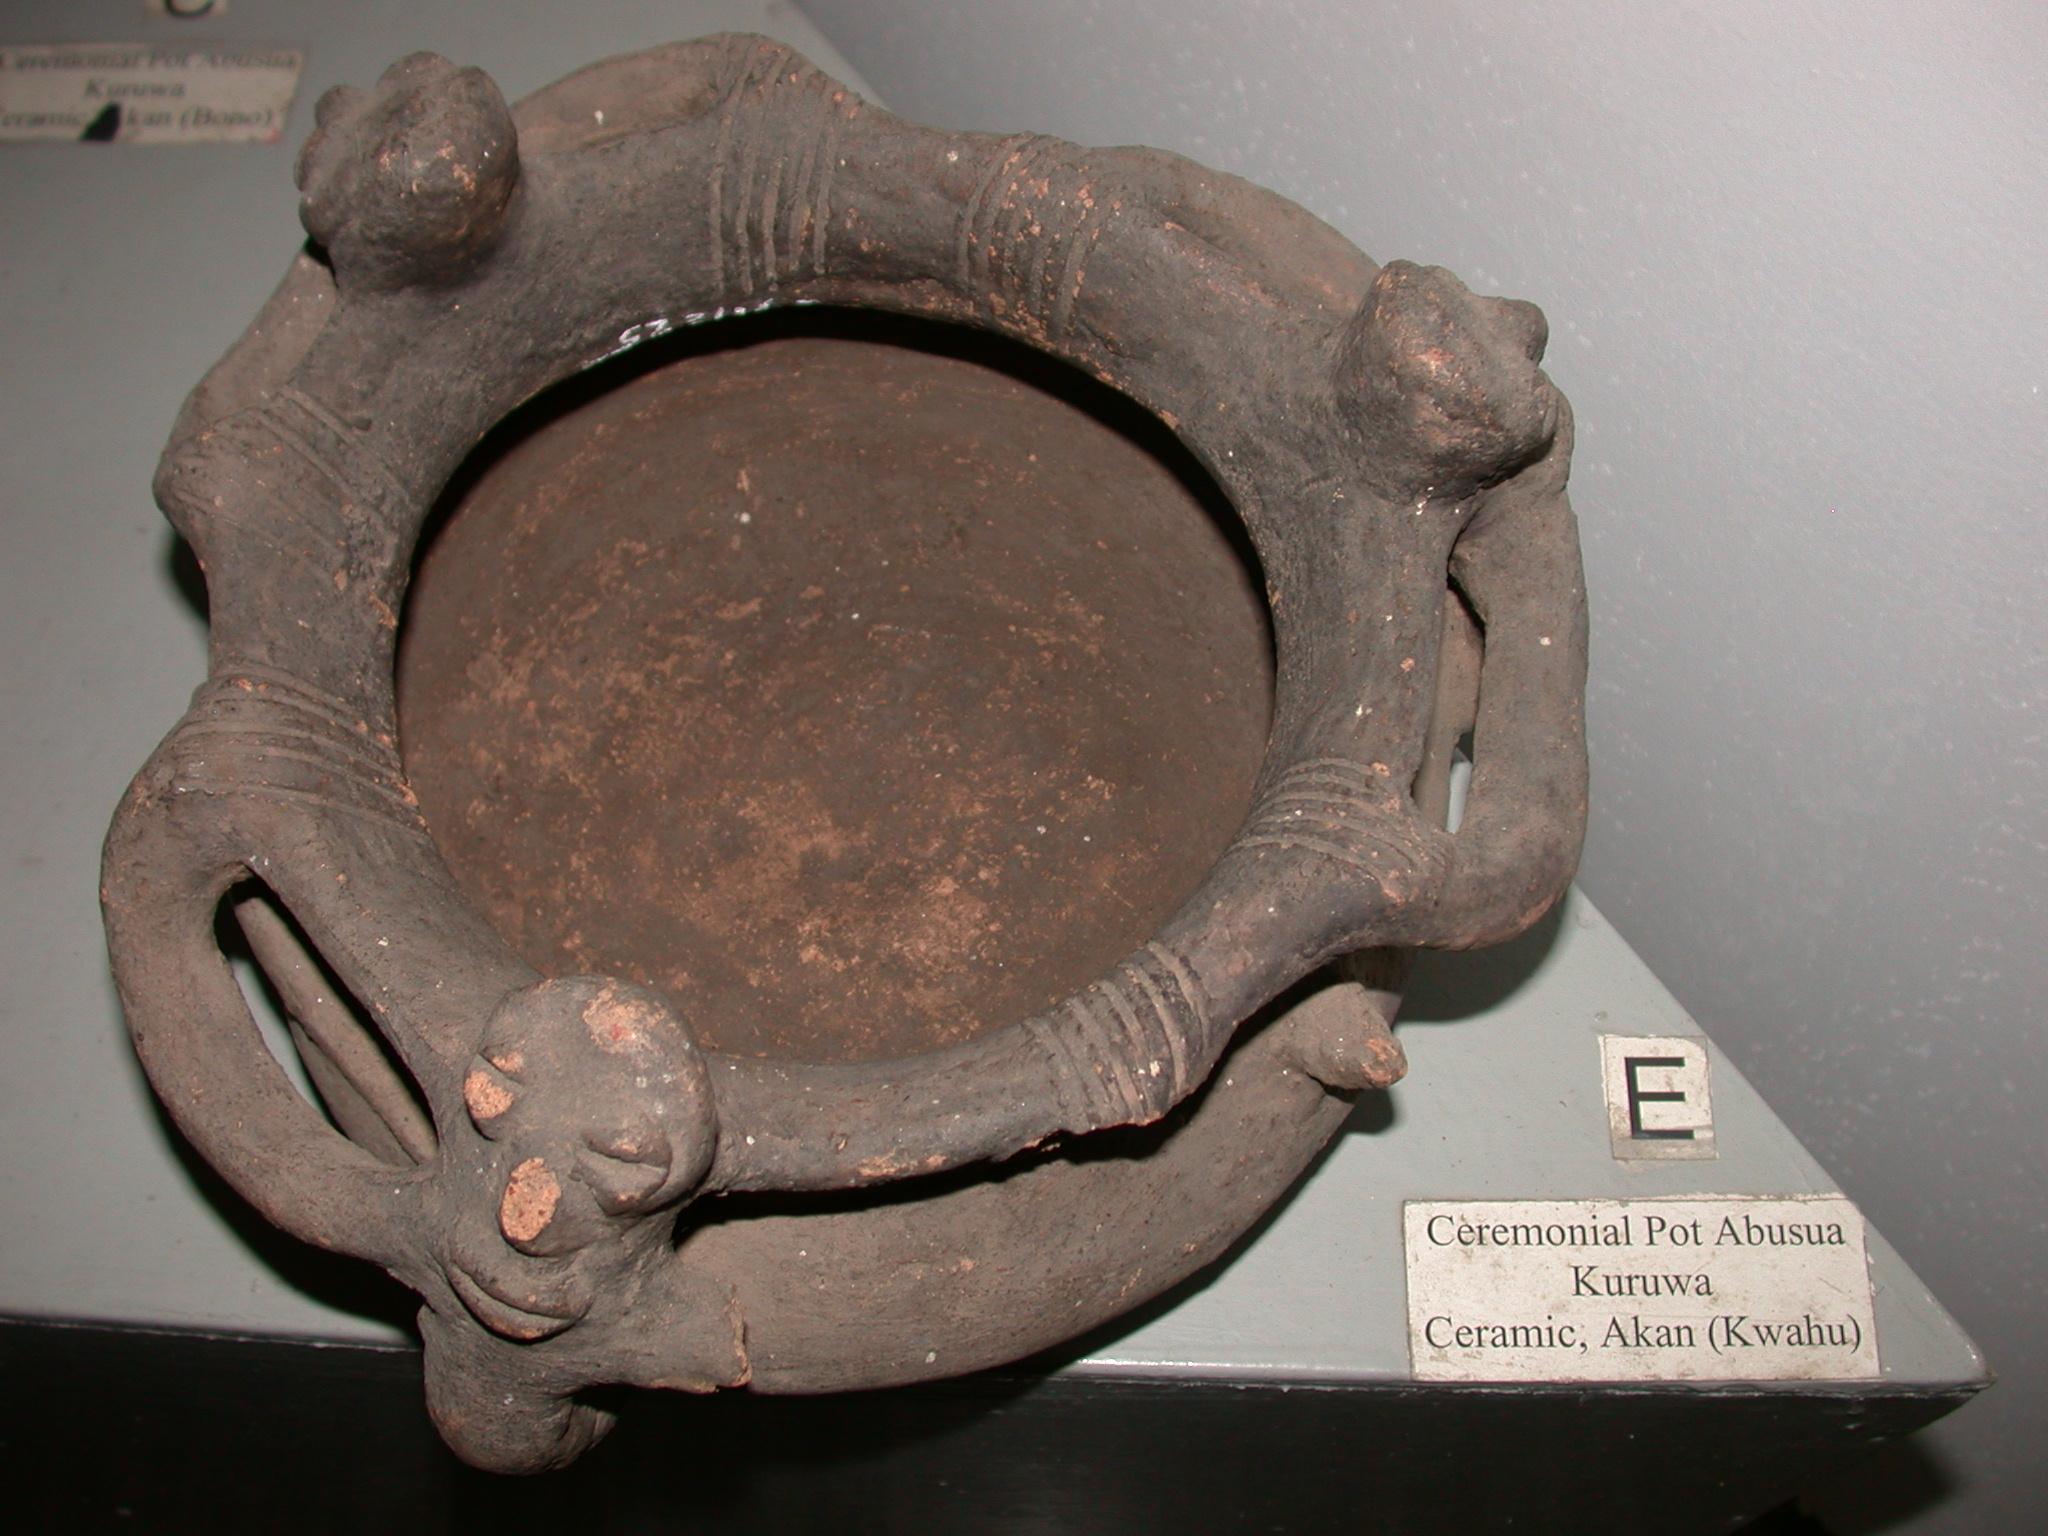 Akan Ceramic Ceremonial Pot Abusua, Kuruwa, Kwahu, National Museum, Accra, Ghana